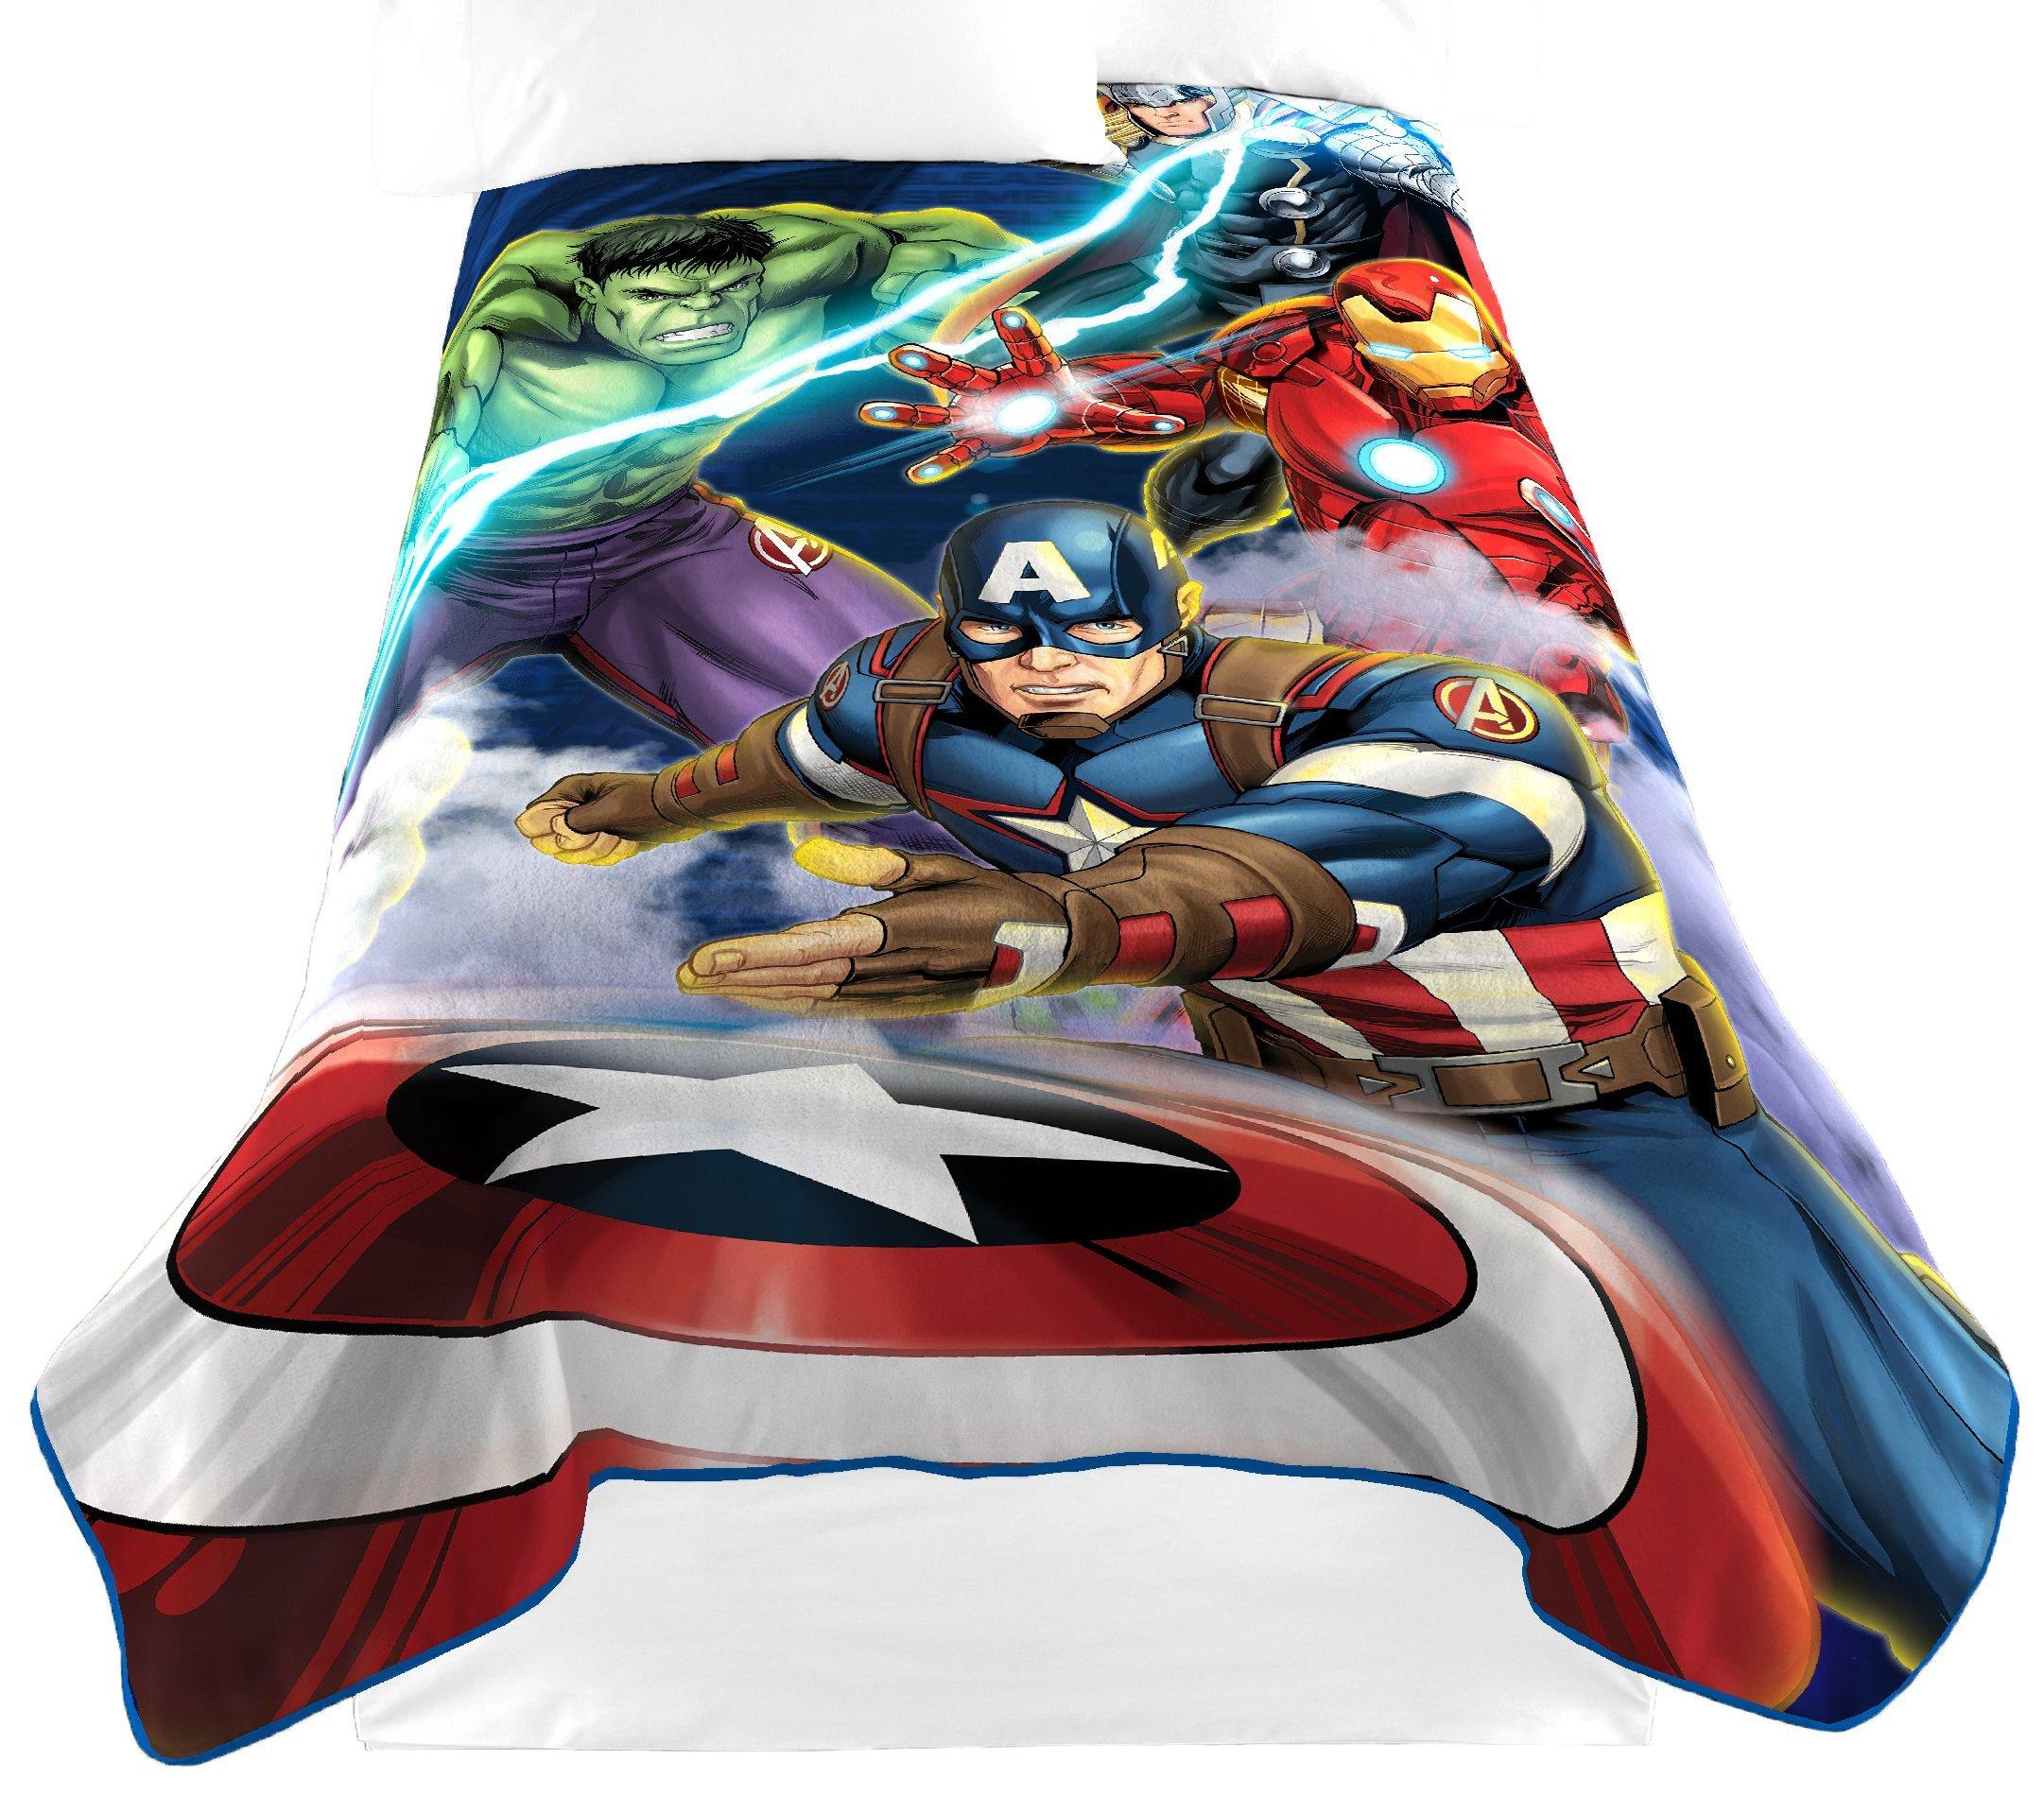 Marvel Avengers Blue Circle Fleece Plush Blanket, 62 x 90/Twin by Jay Franco (Image #1)